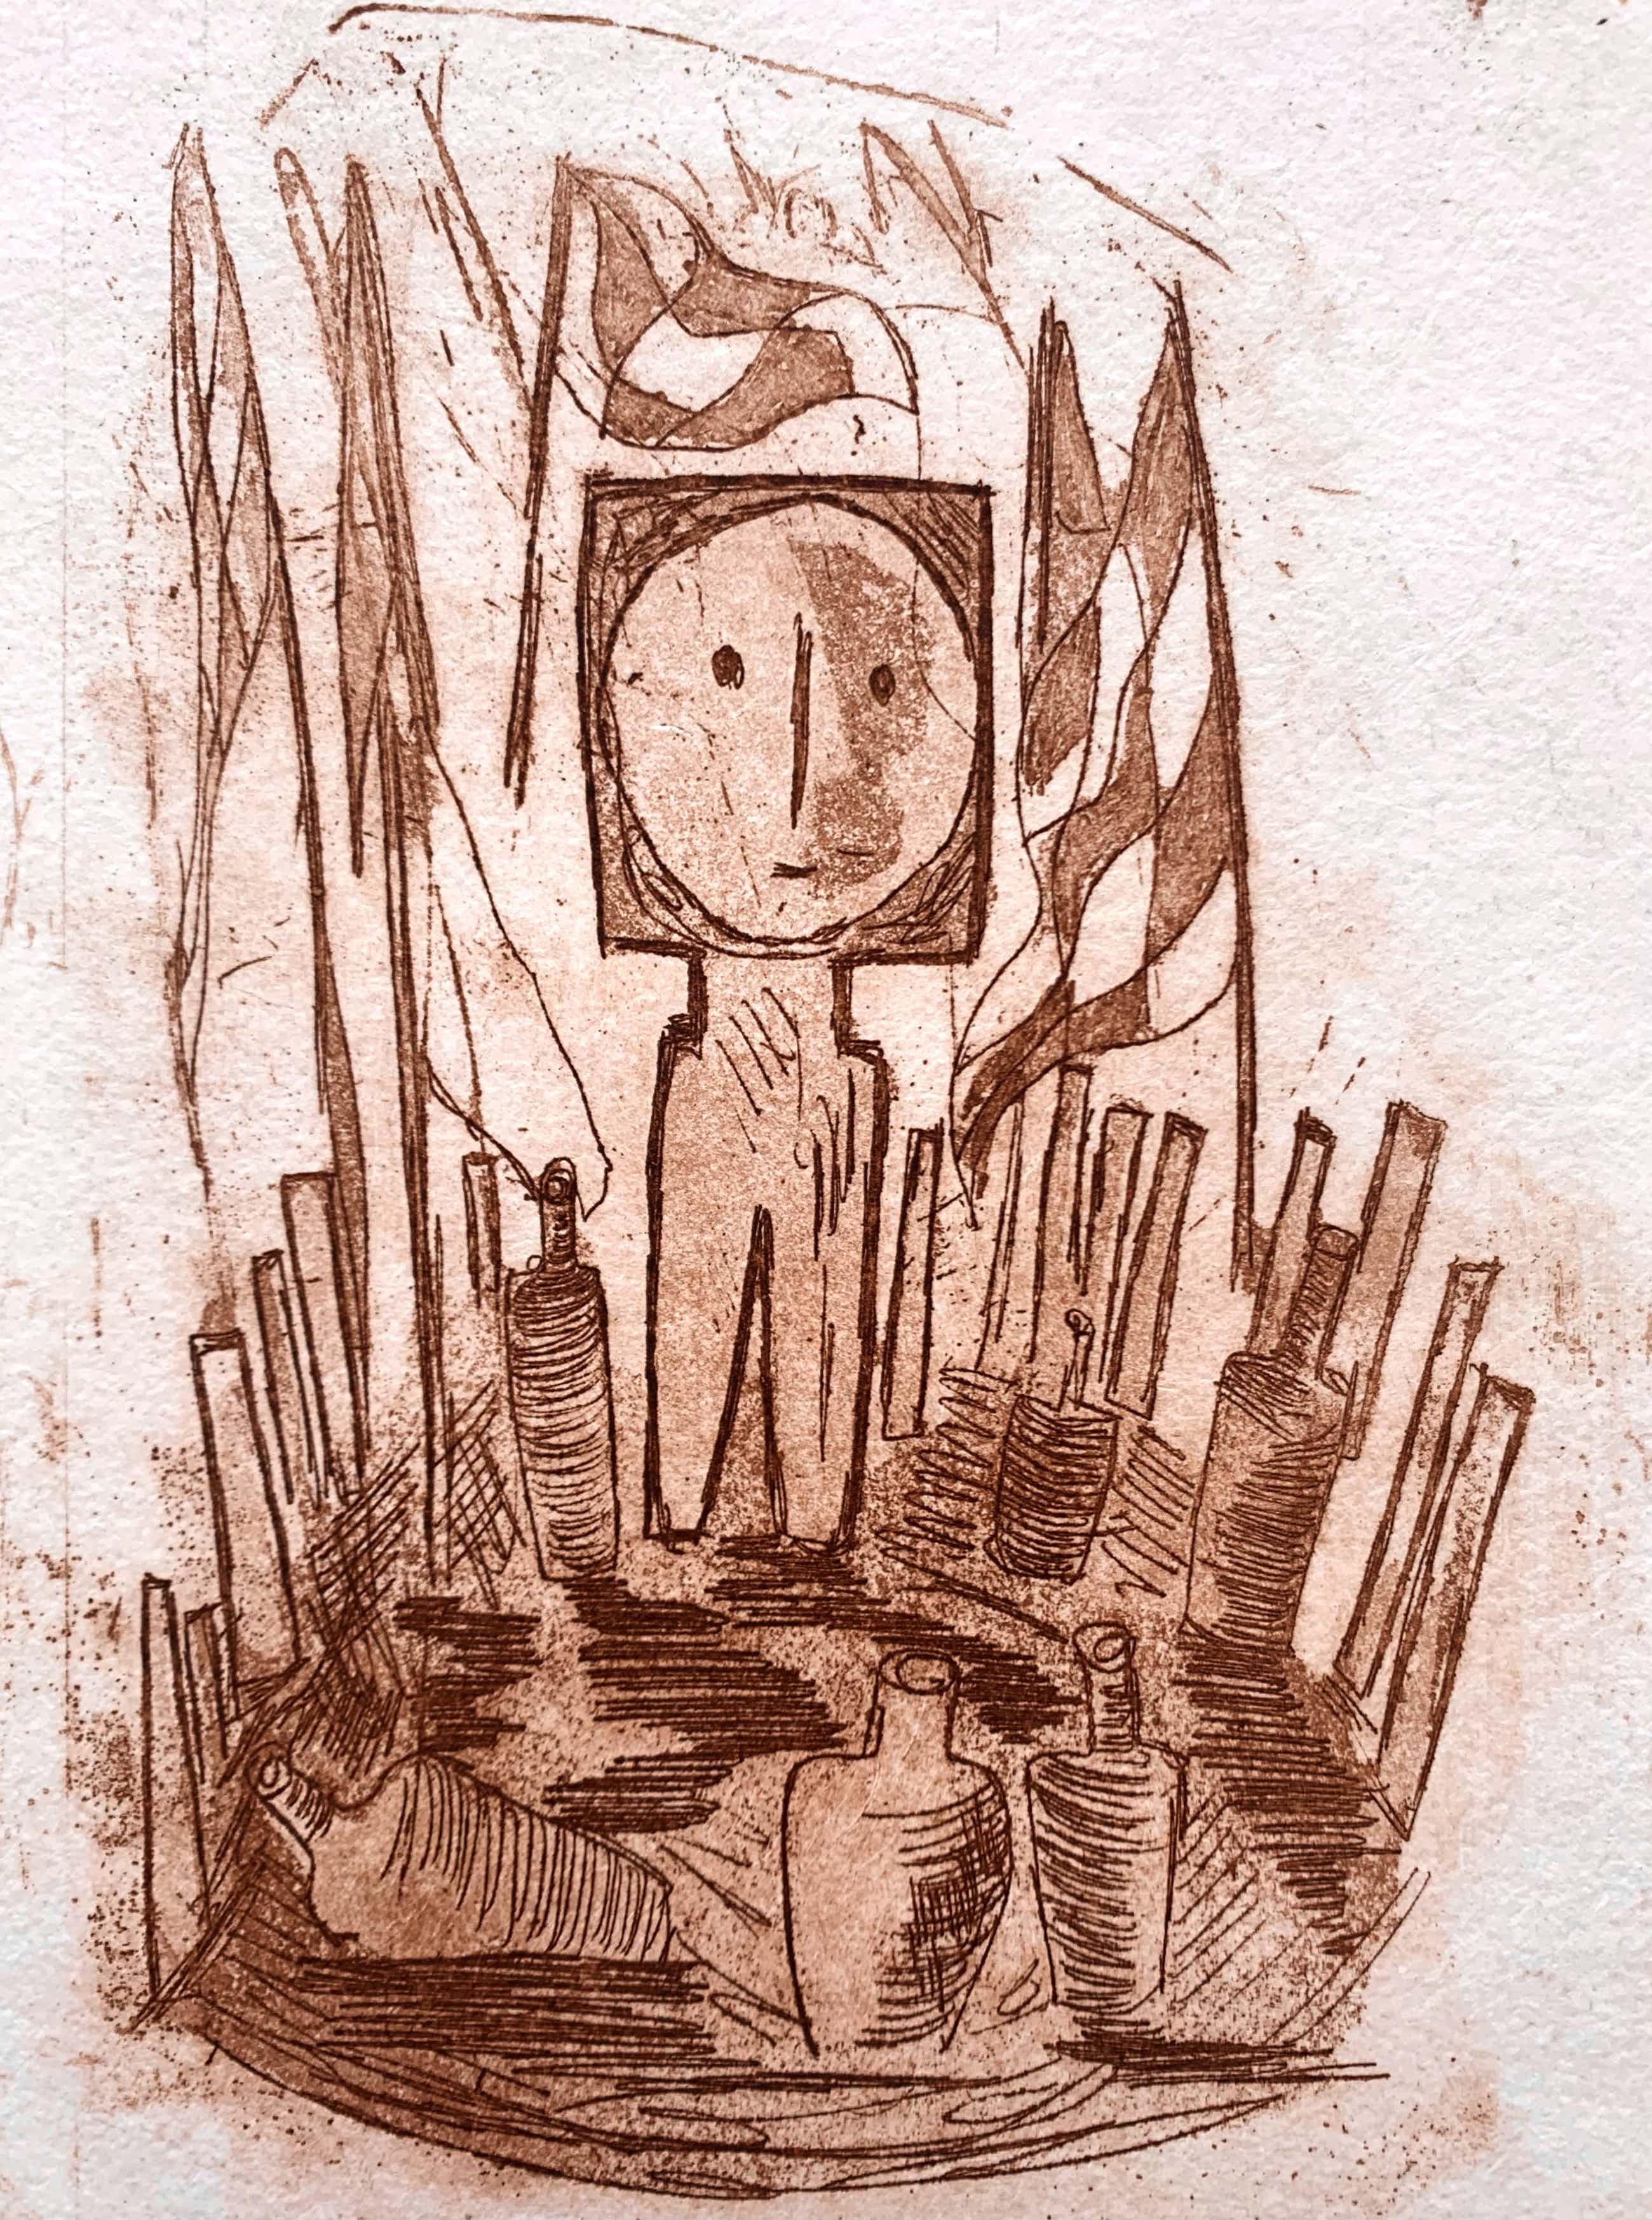 John Lie a Fo - kleurenets - 'Place sacré' - 1996 kopen? Bied vanaf 60!